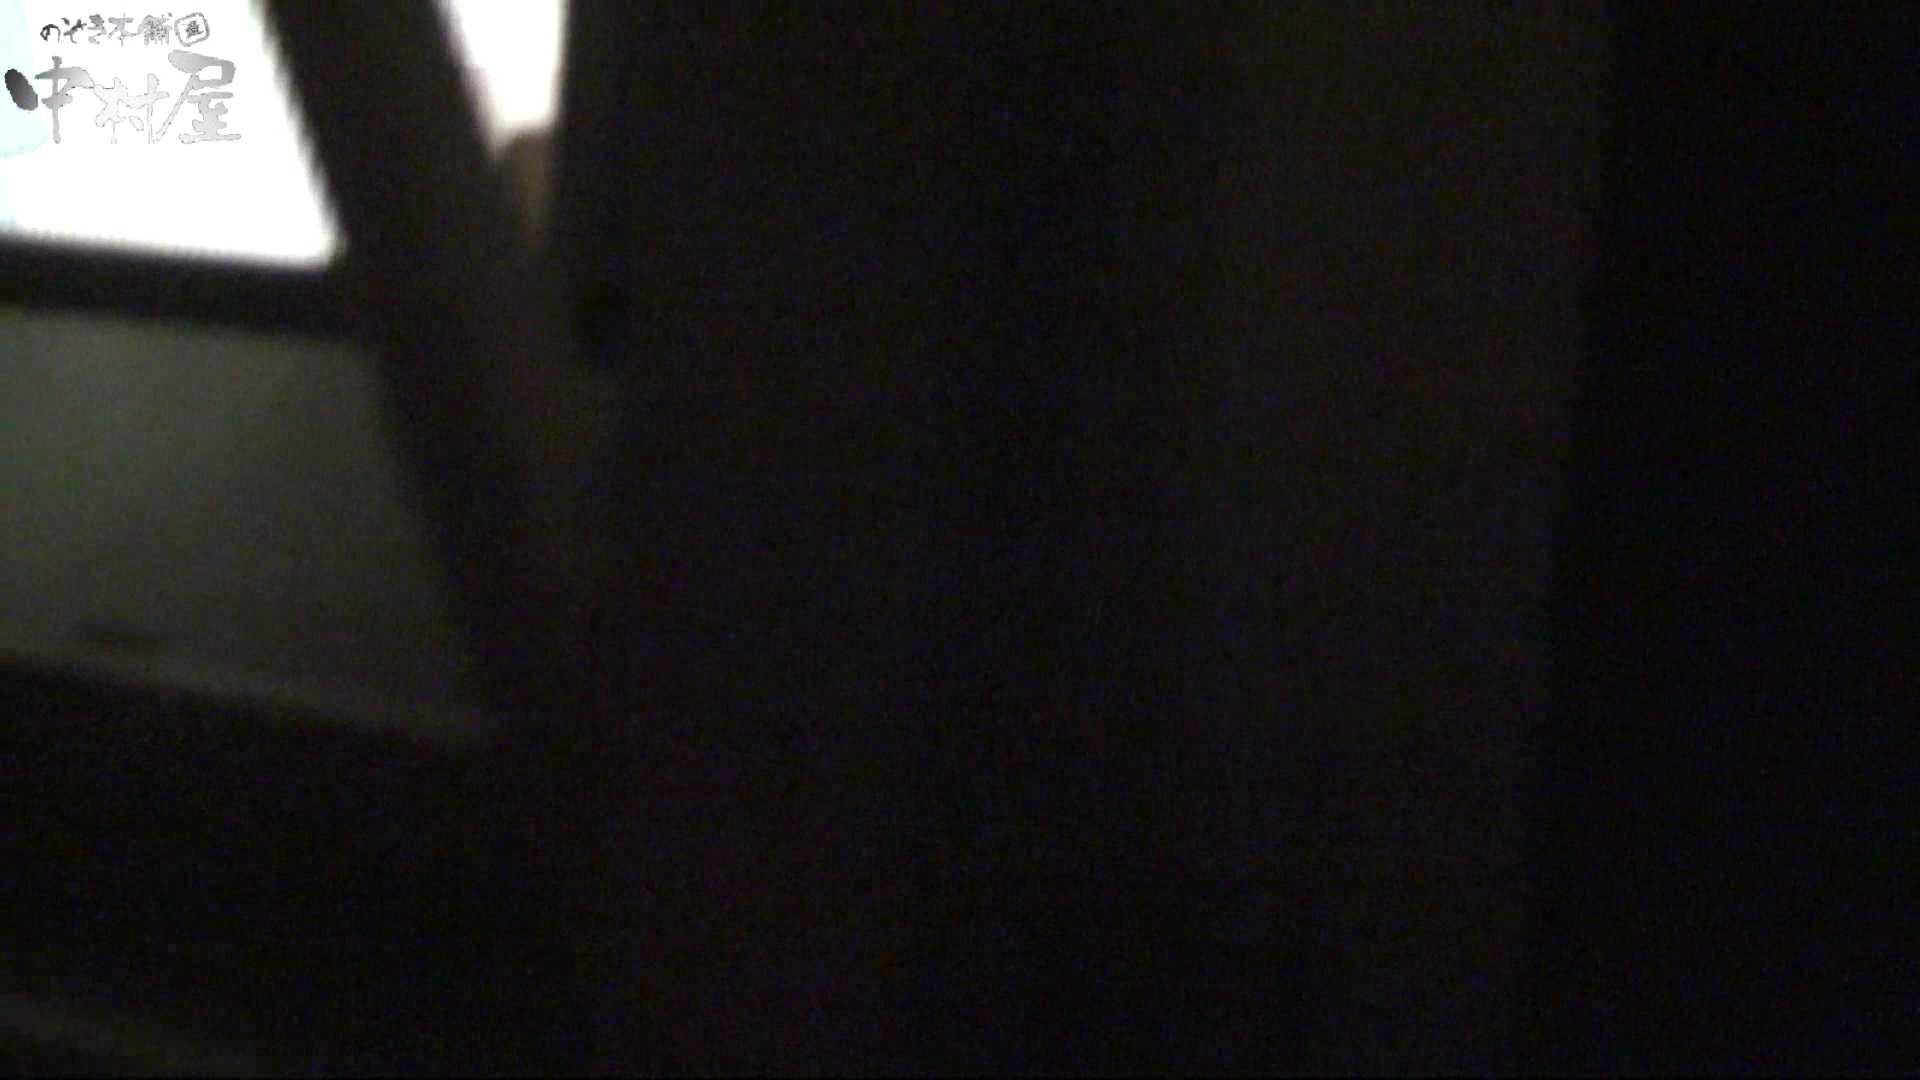 民家風呂専門盗撮師の超危険映像 vol.027 民家 えろ無修正画像 112枚 17